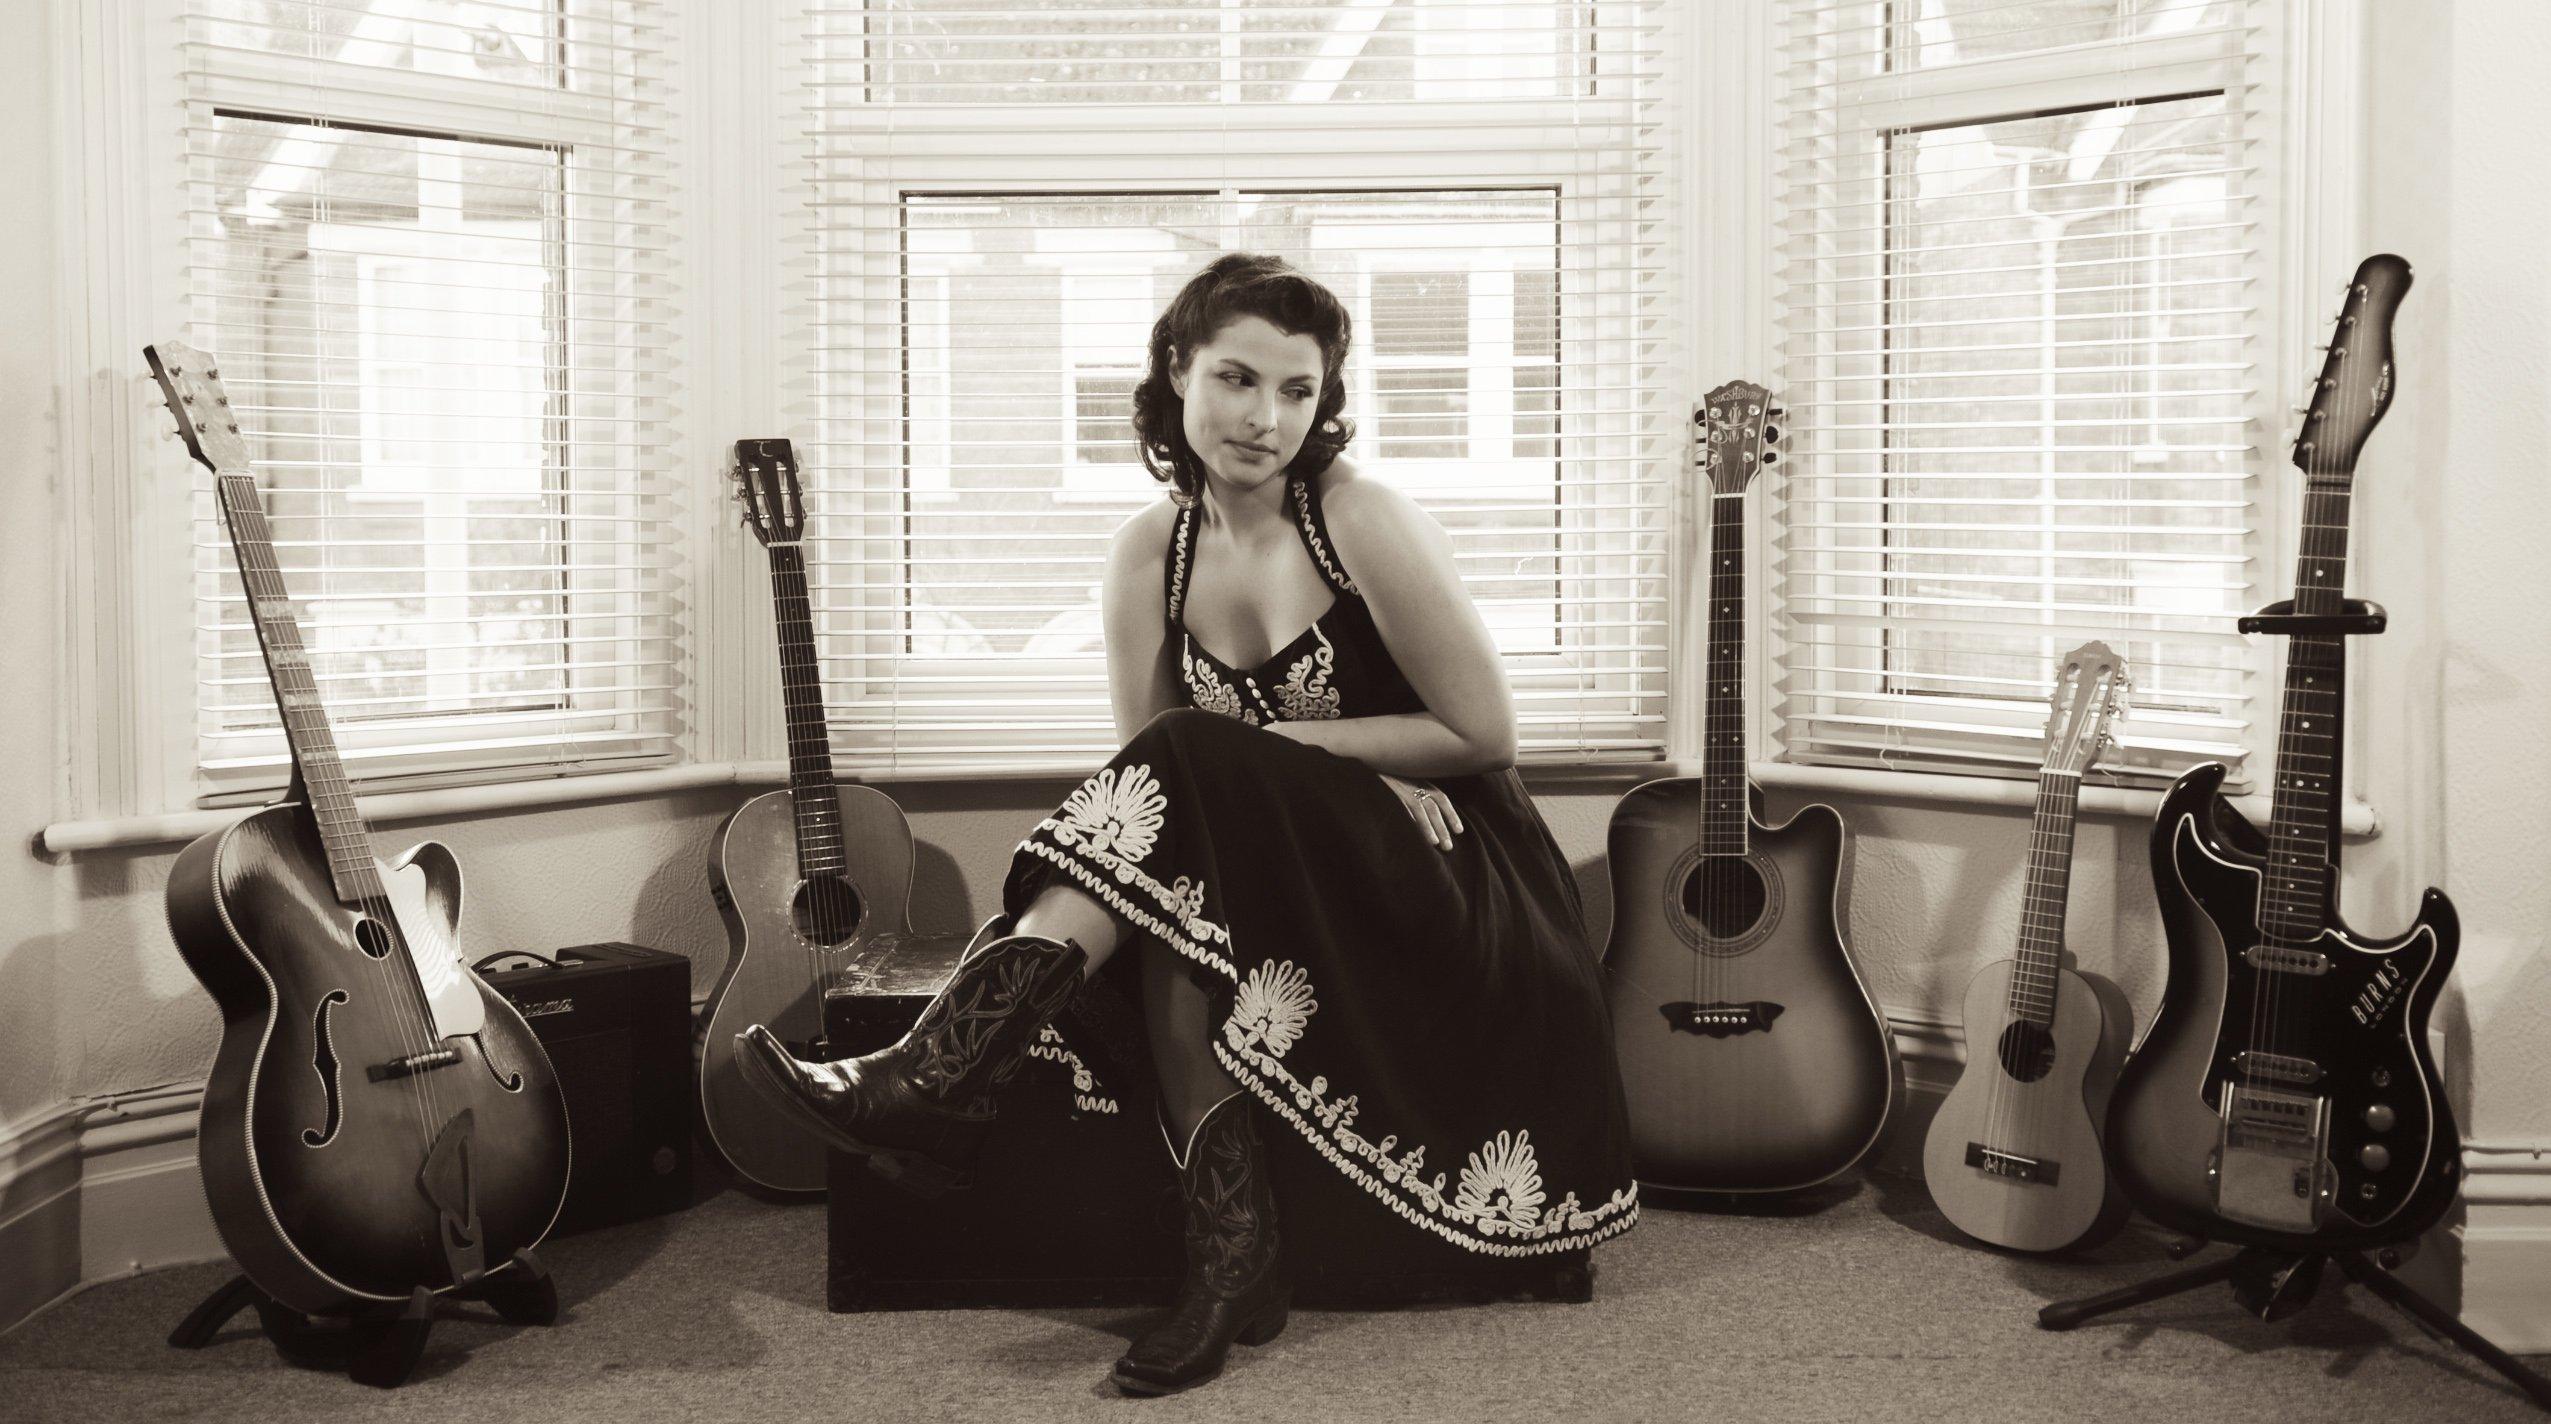 Danni Nicholls with Guitars